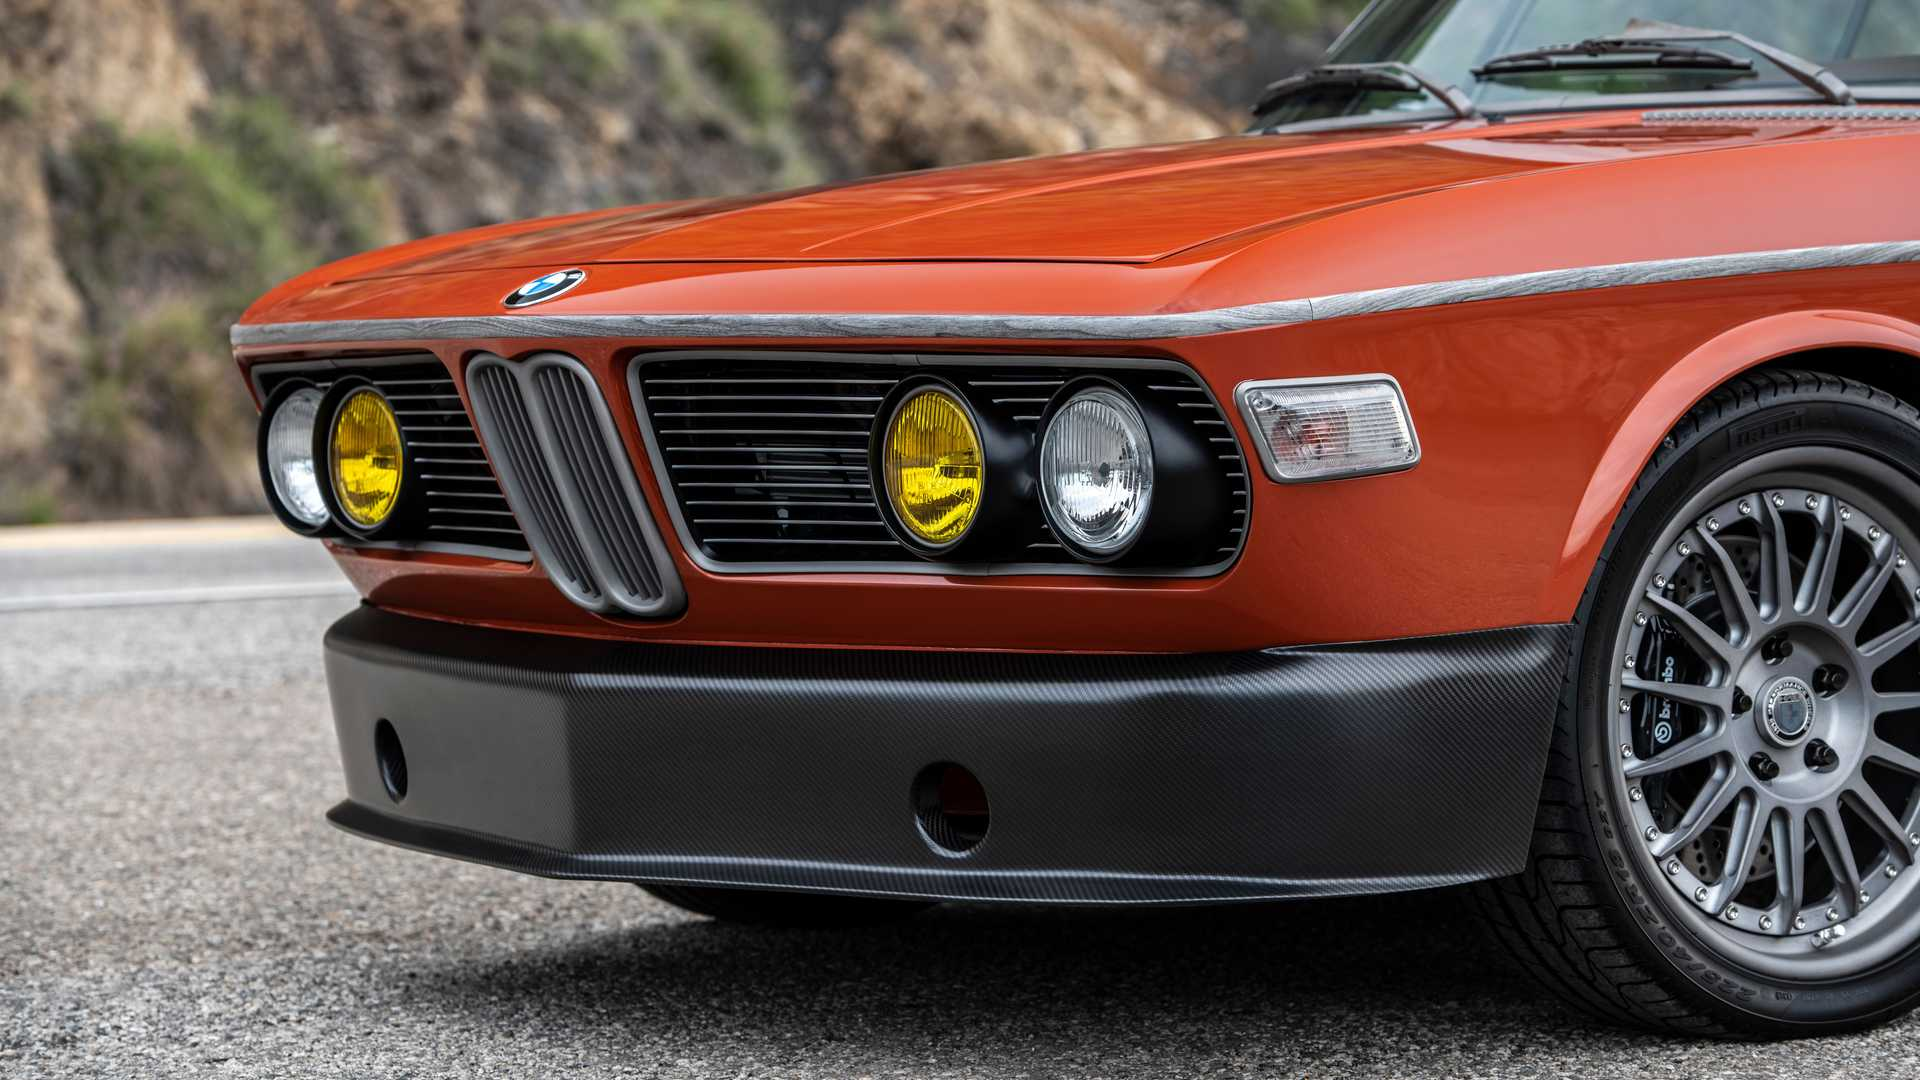 Robert Downey Jr Restorasi BMW Klasik, Makin Kece